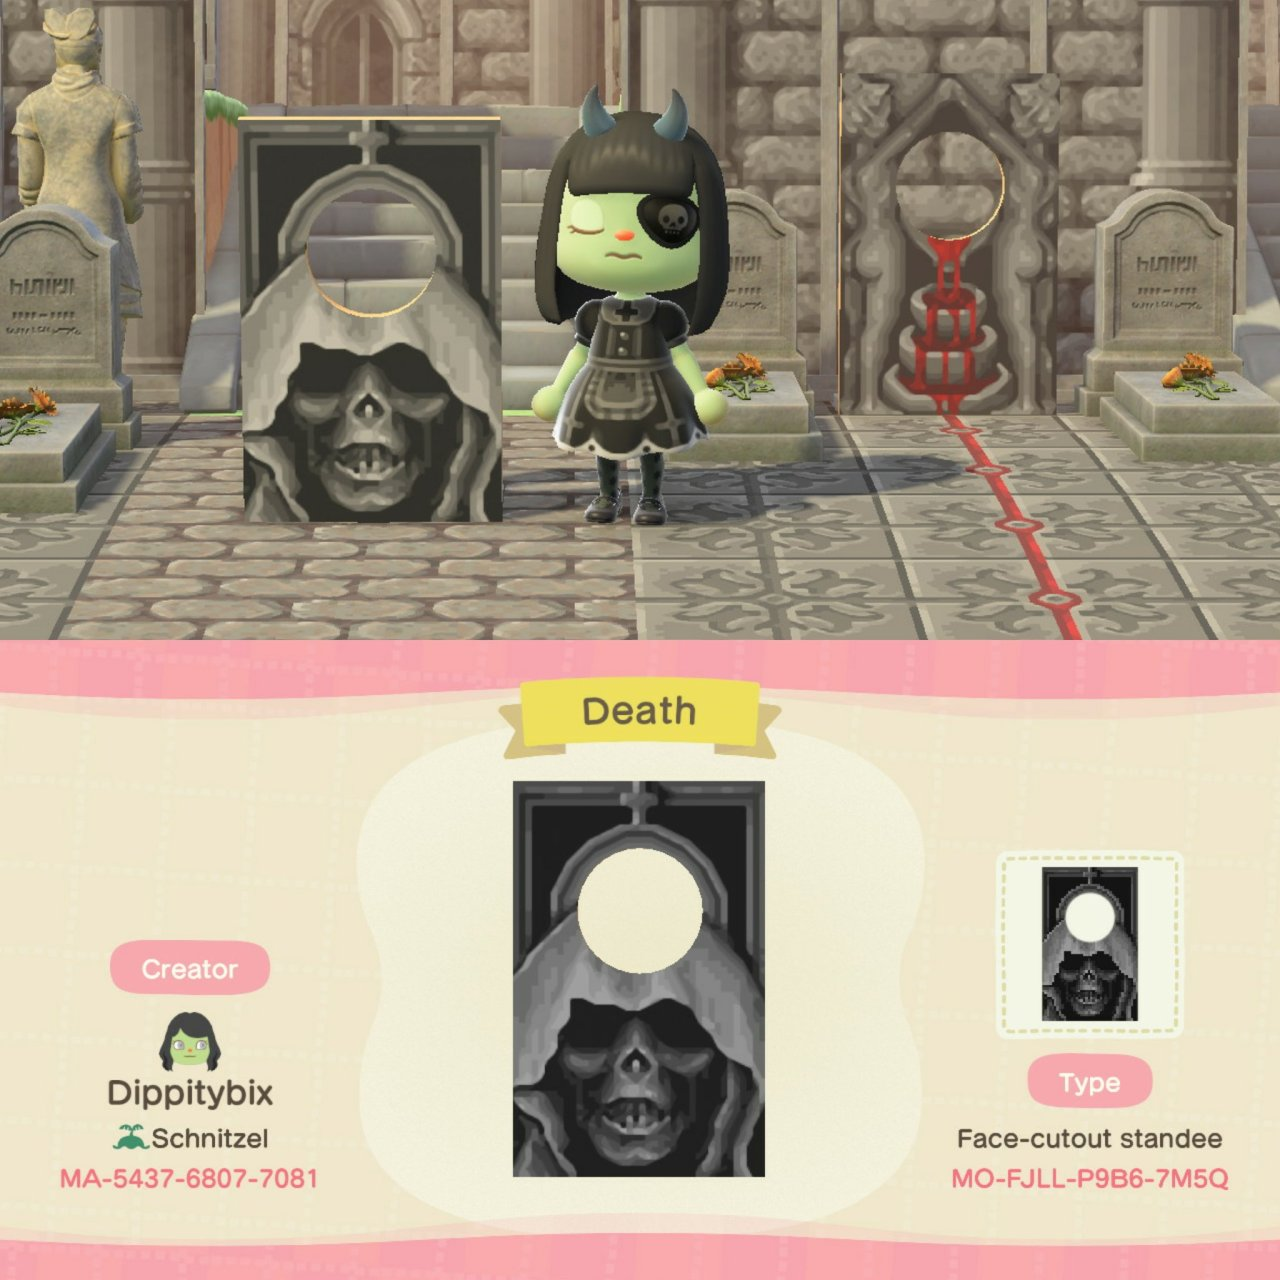 qr-closet:death standee ✨